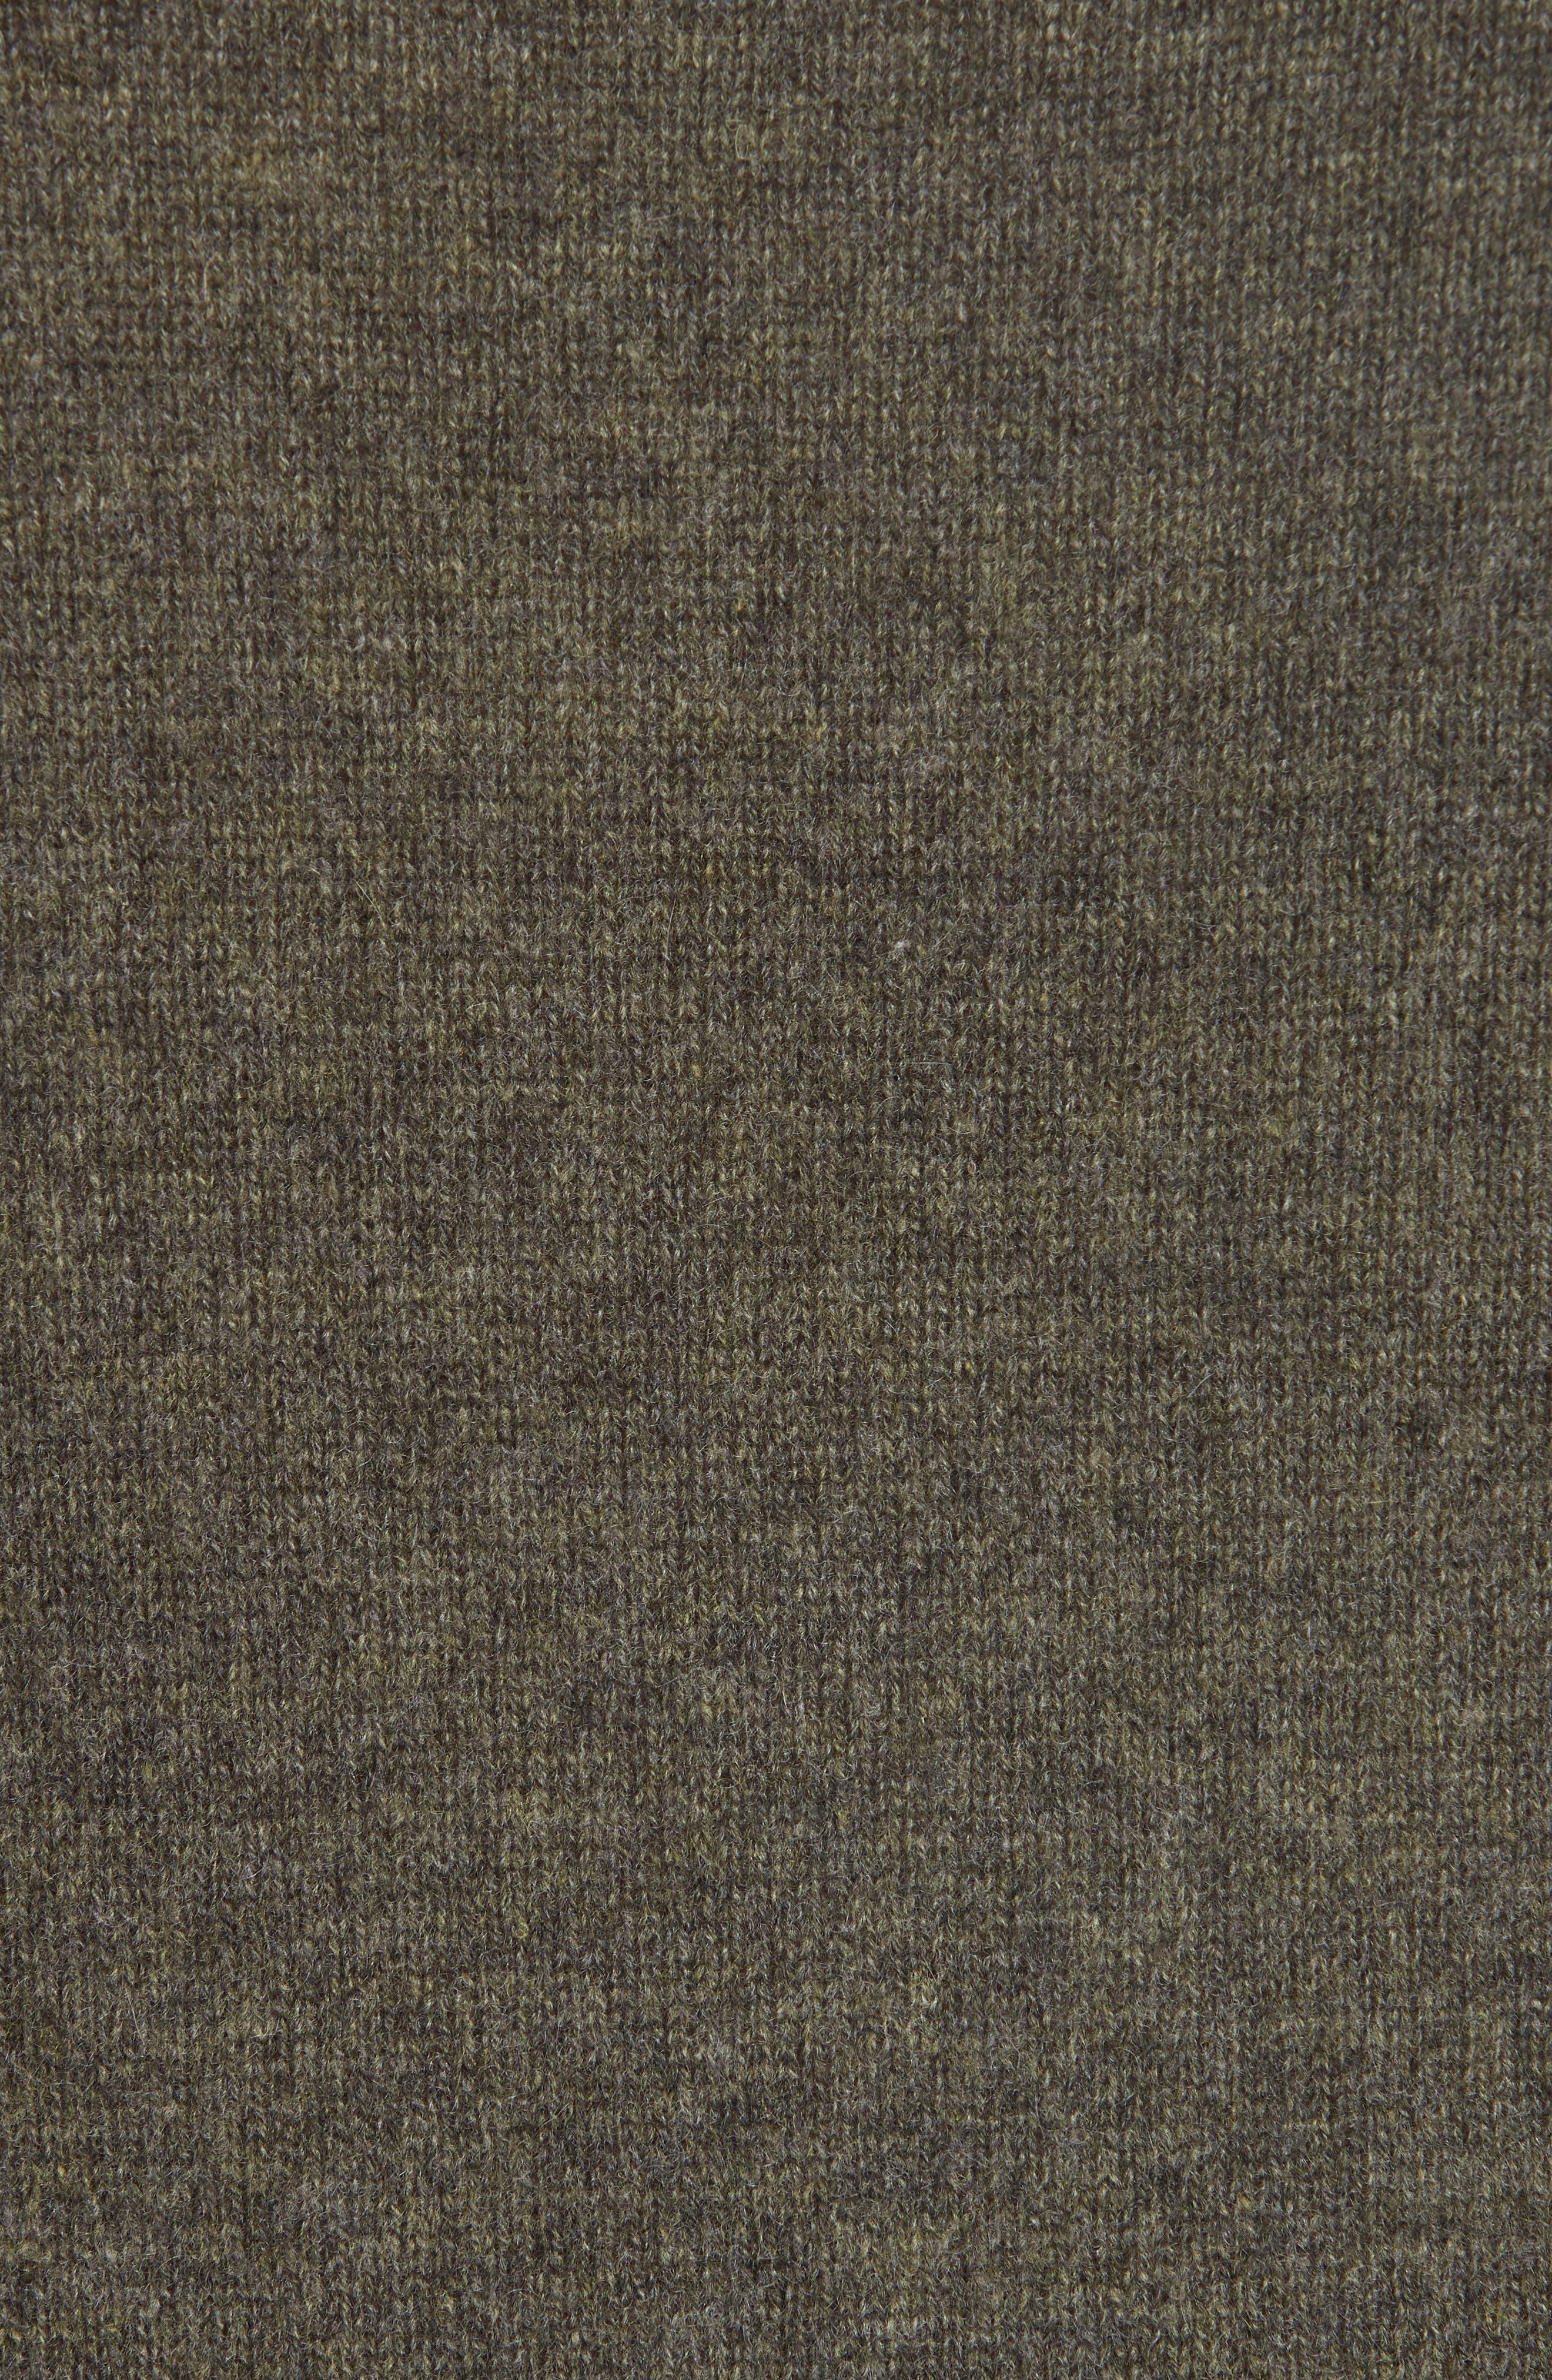 Cashmere V-Neck Sweater,                             Alternate thumbnail 5, color,                             335